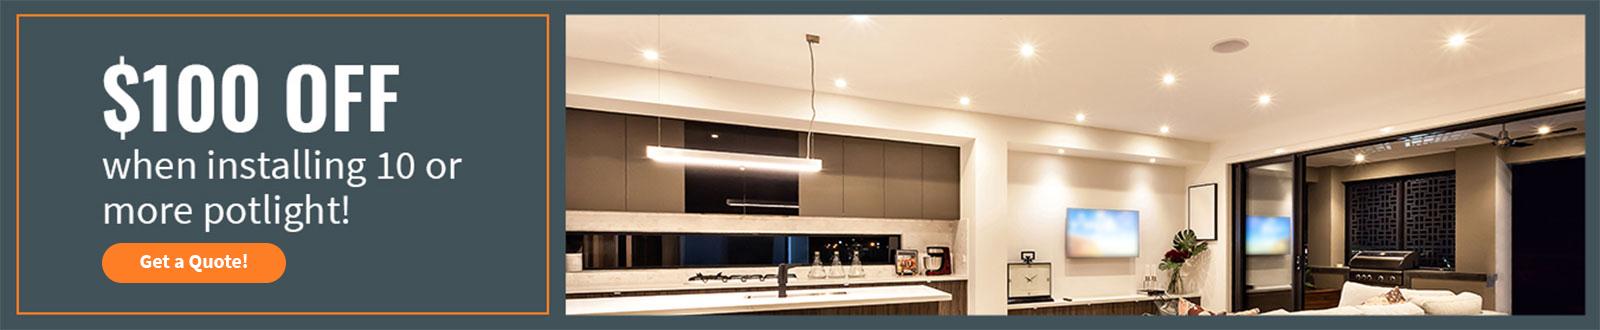 Pot Light Installation, Outdoor, Indoor Lighting in Toronto, GTA